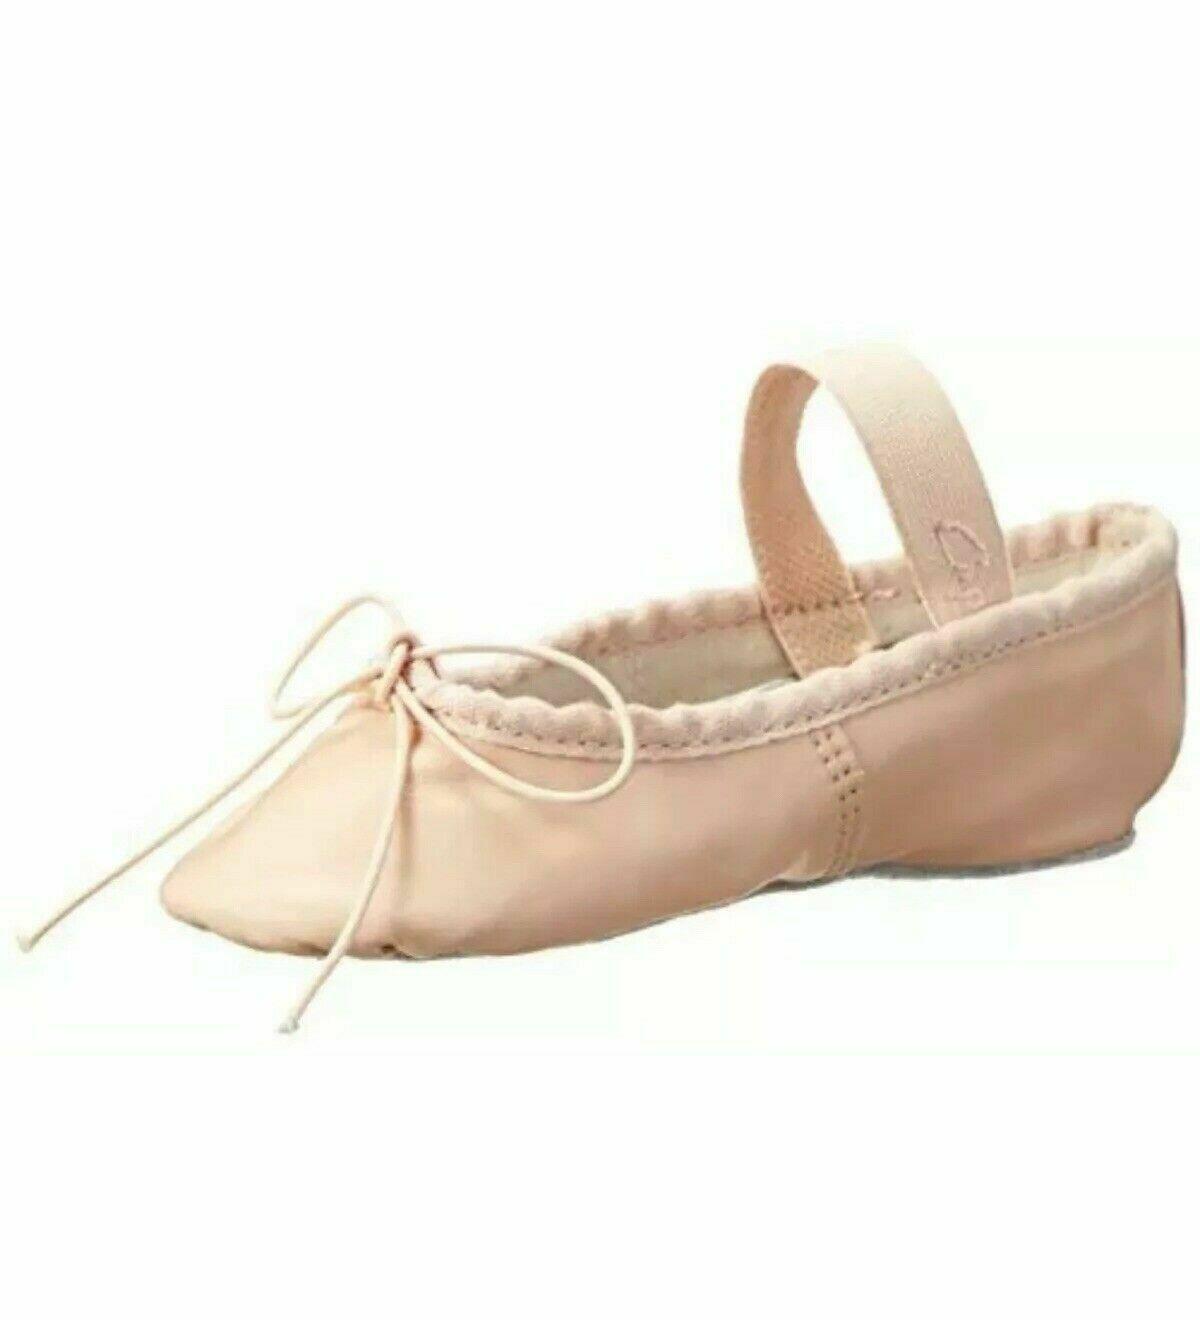 Capezio Youth Teknik 200C NPK Pink Full Sole Ballet Shoe Size 2.5B 2.5 B